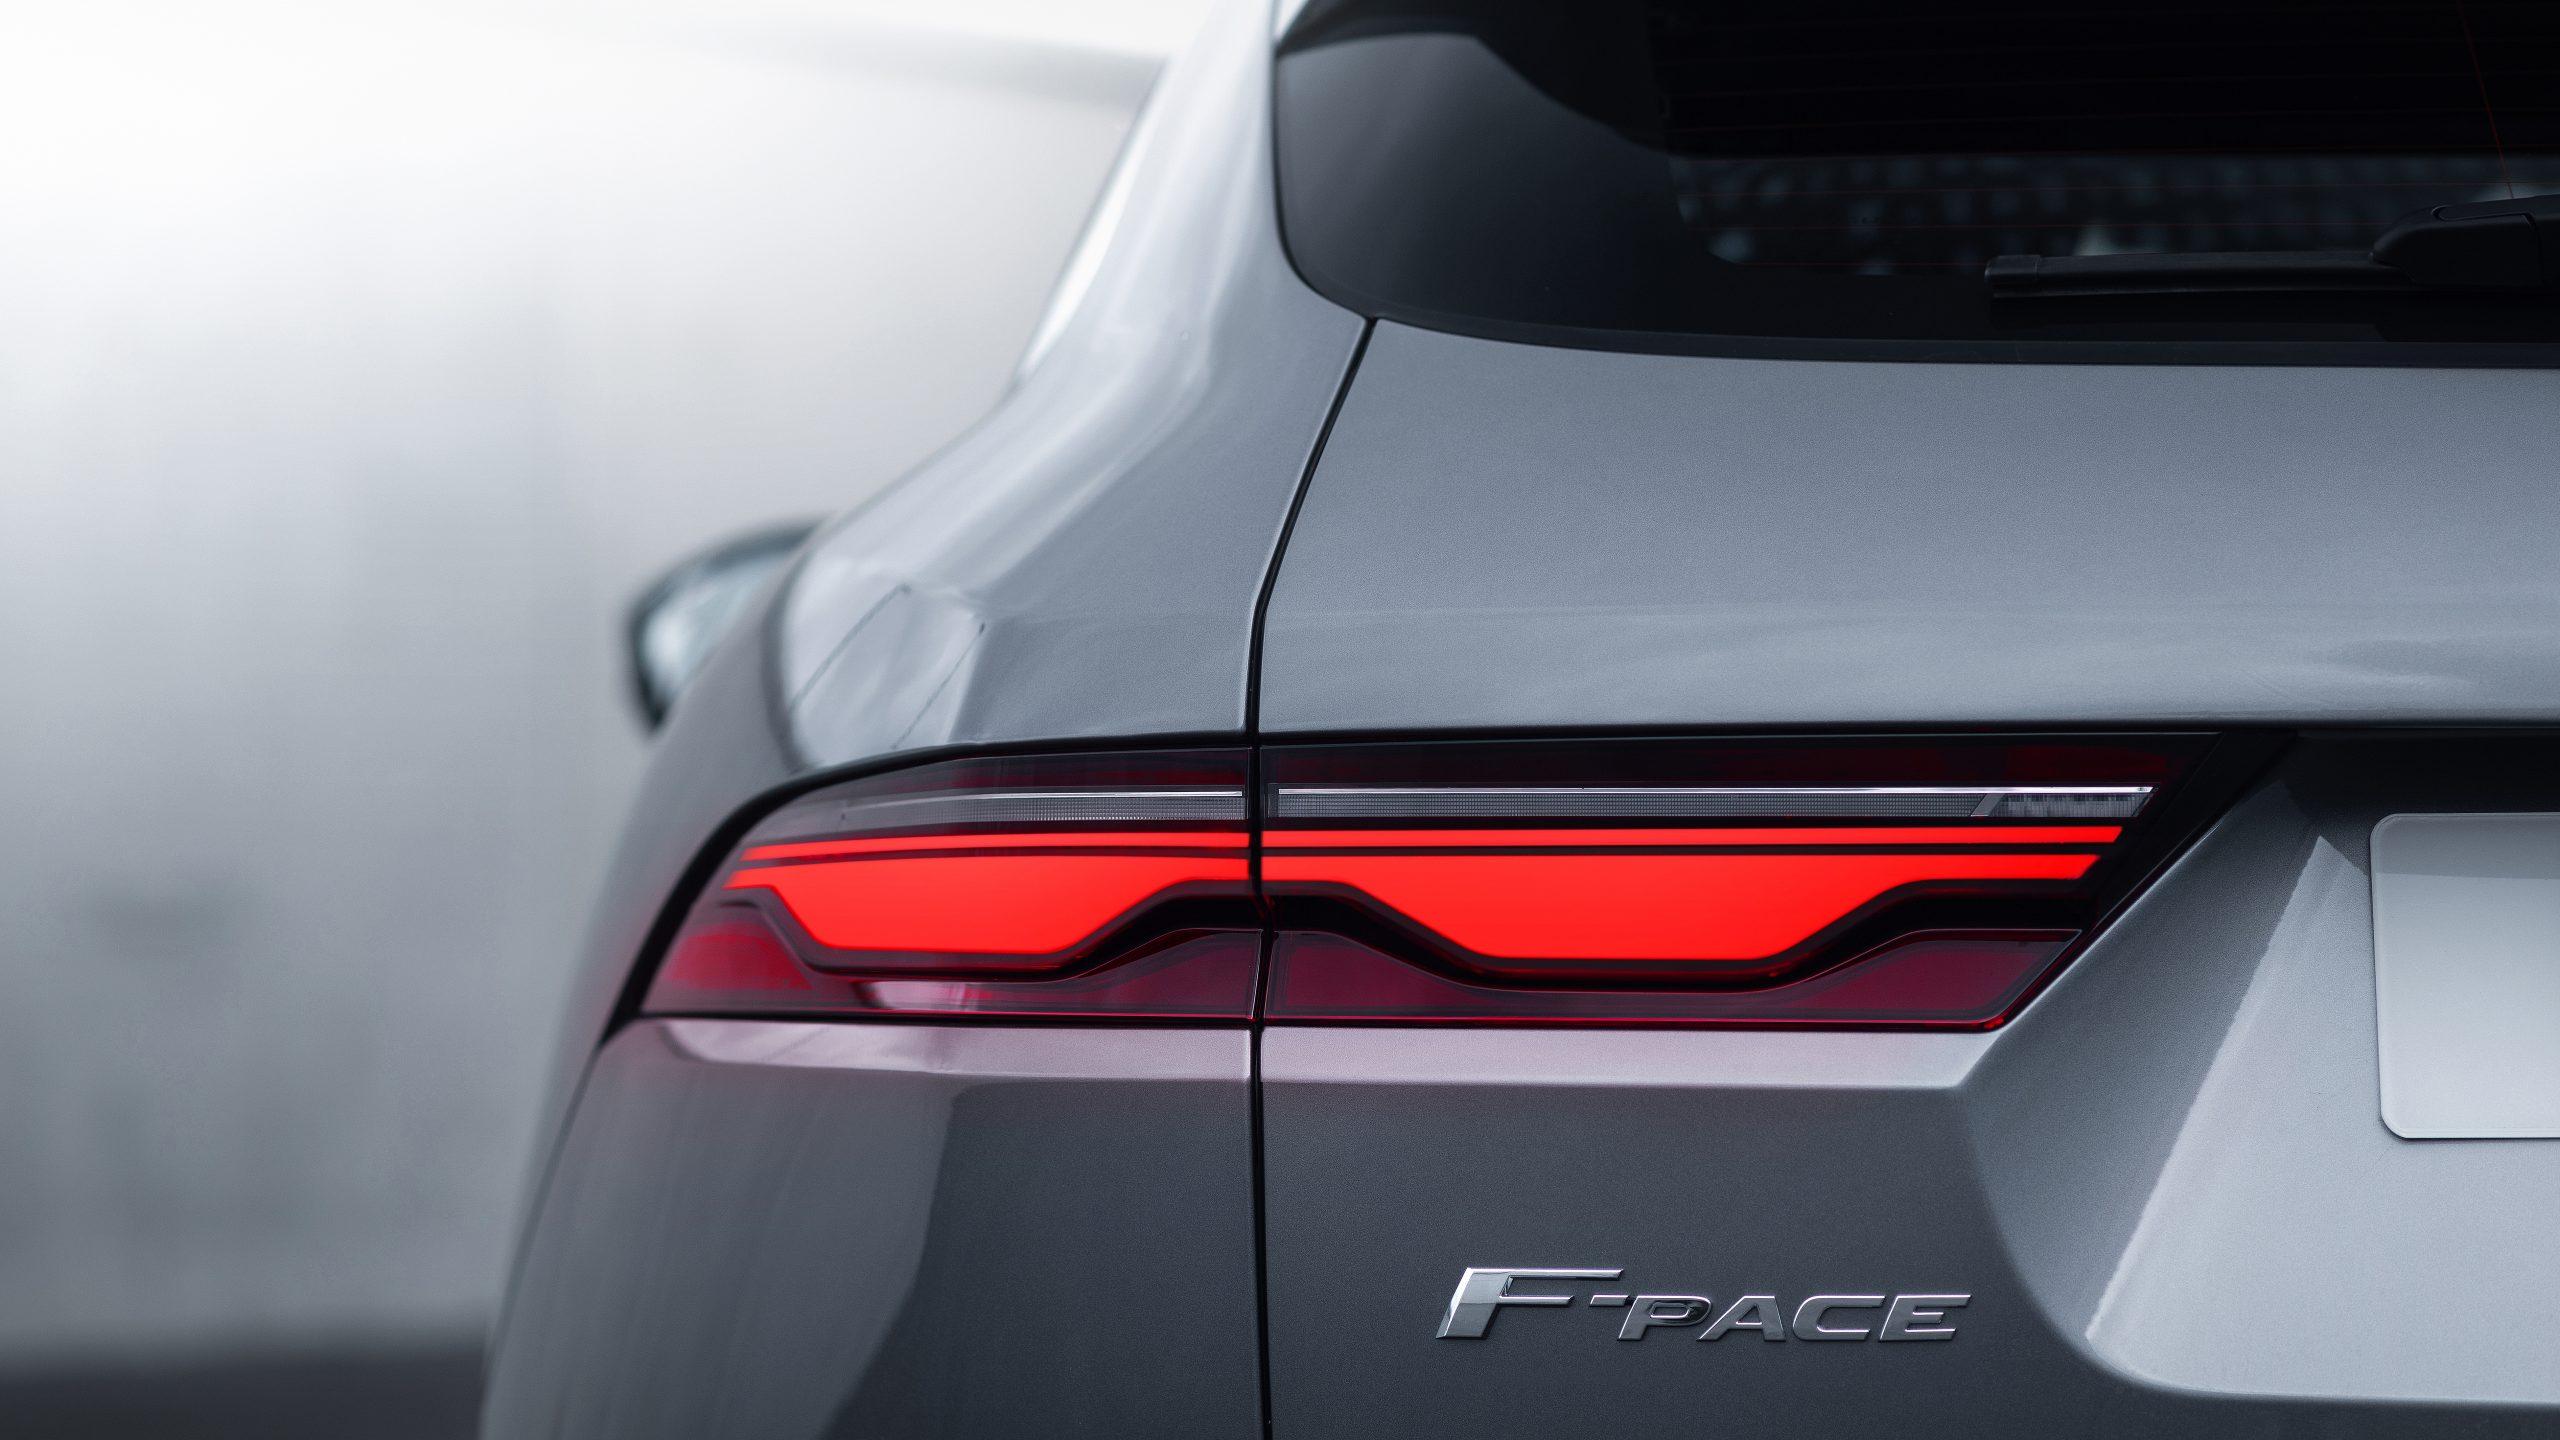 2021 Jaguar F-PACE exterior taillight